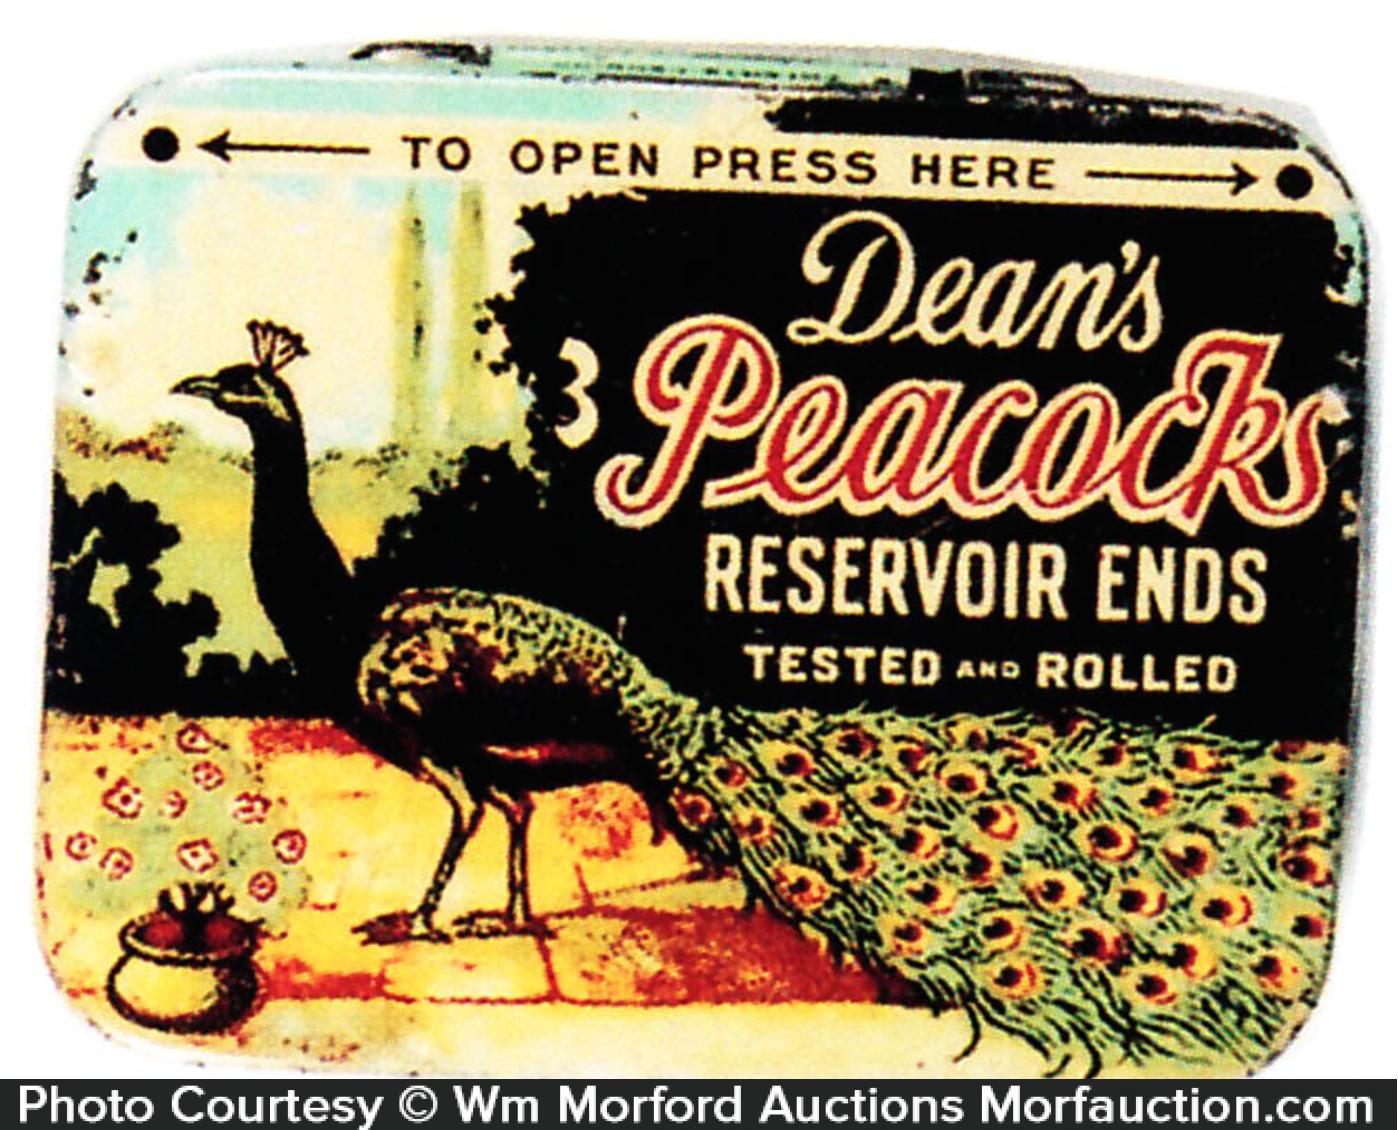 Dean's Peacock Reservoir Ends Tin